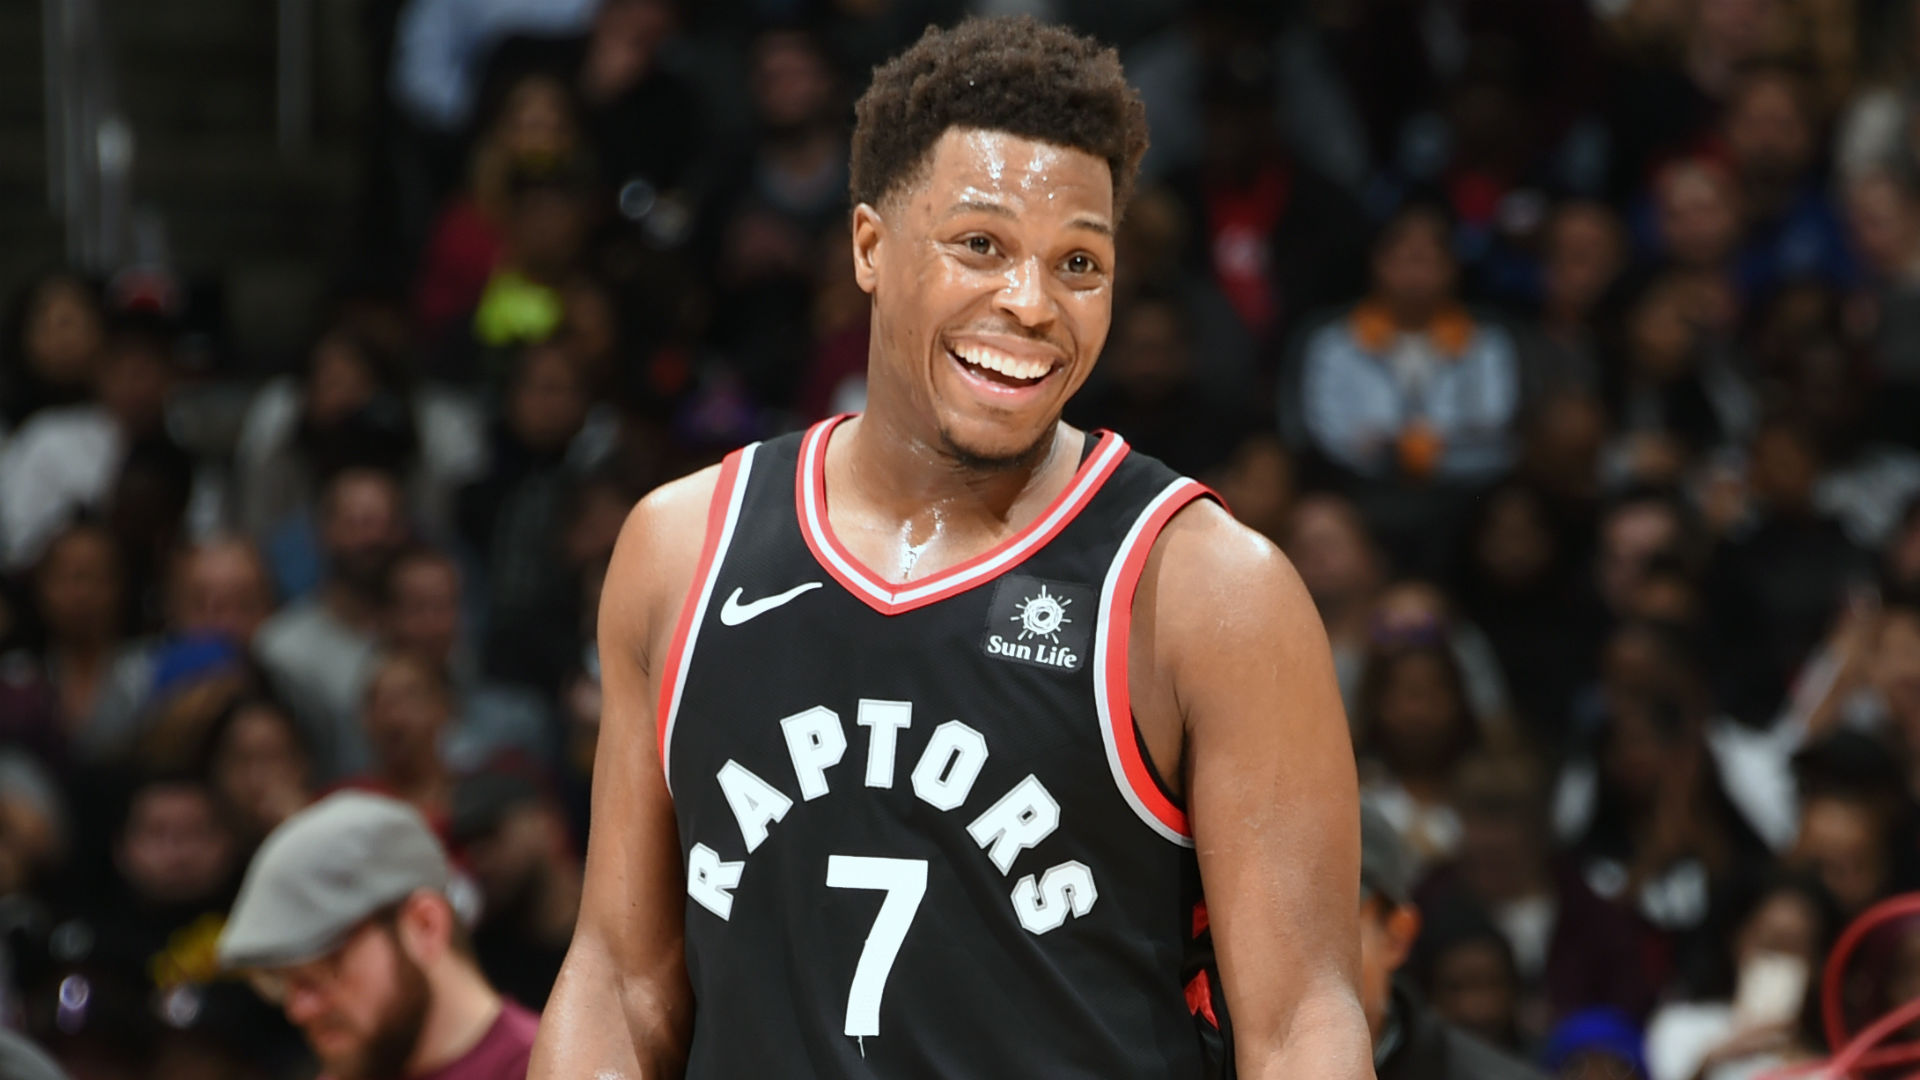 Kyle Lowry To Miss Raptors Preseason Games Vs The Hornets Talkbasket Net